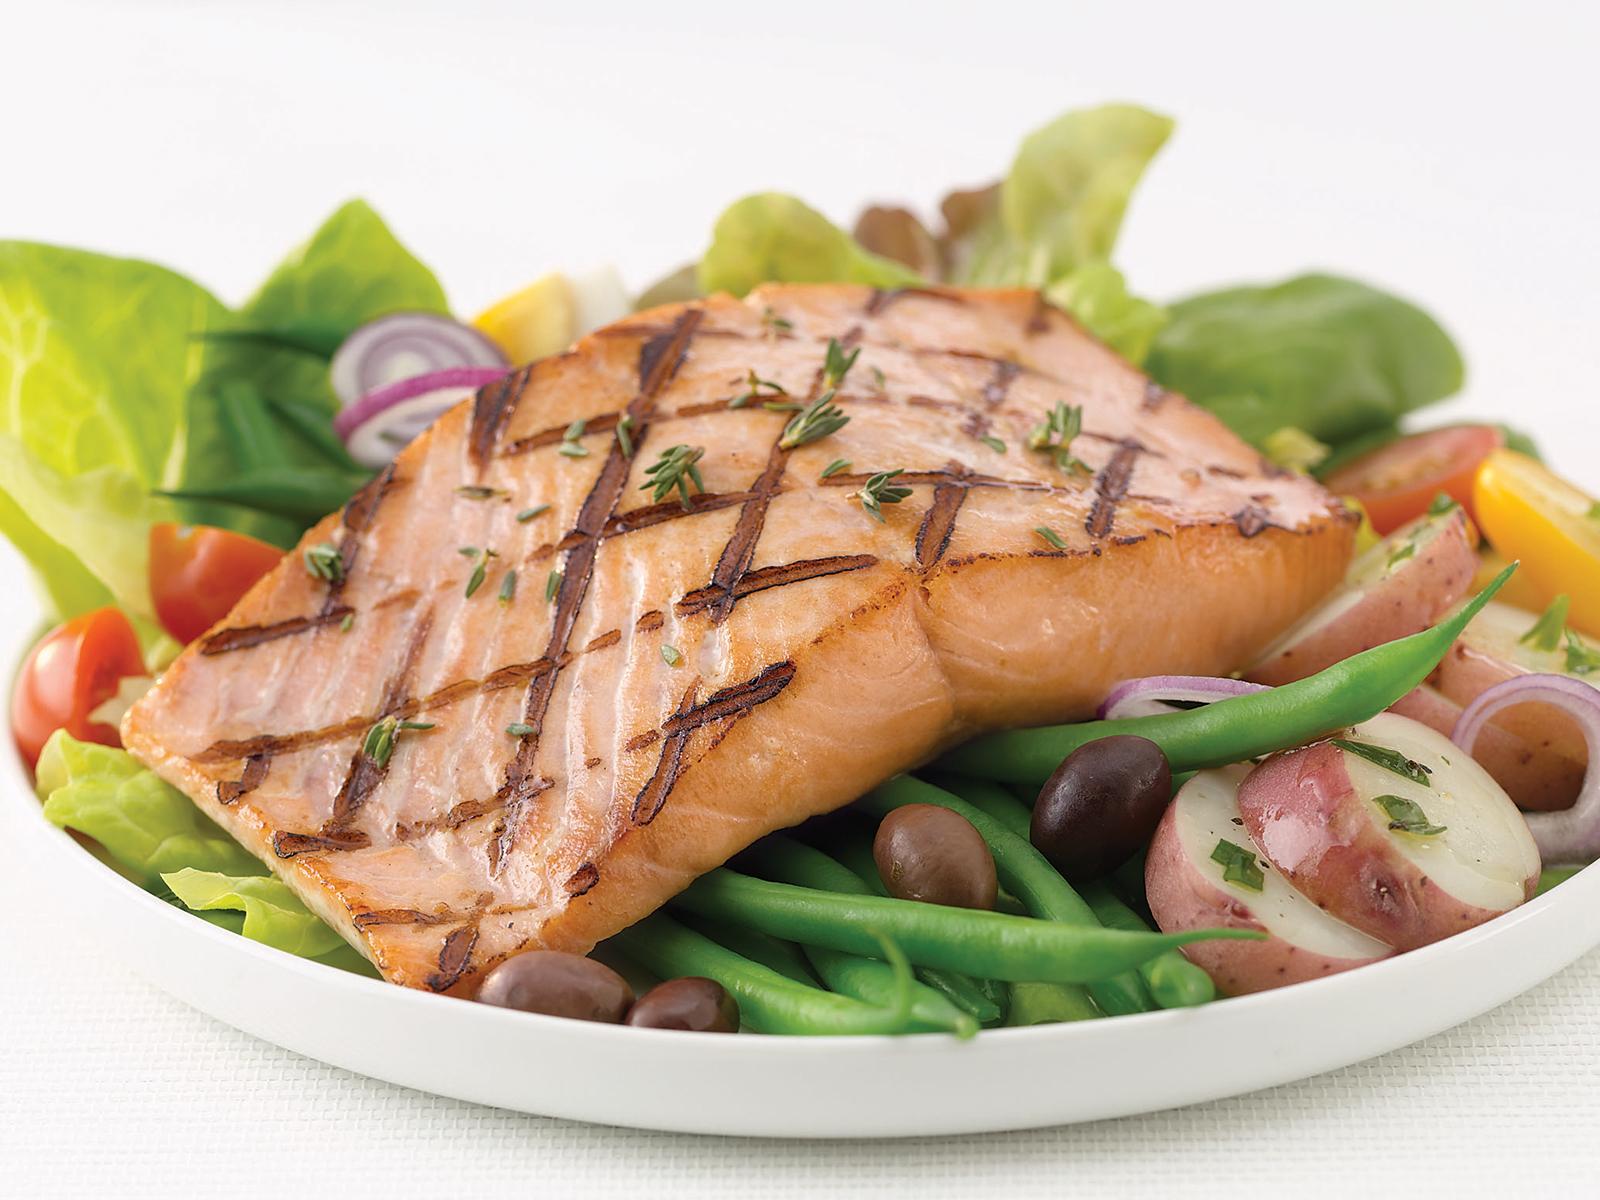 Keta Salmon Premium Portions 4 oz Skls/Bnls/PBO (1/10 lb) 496248